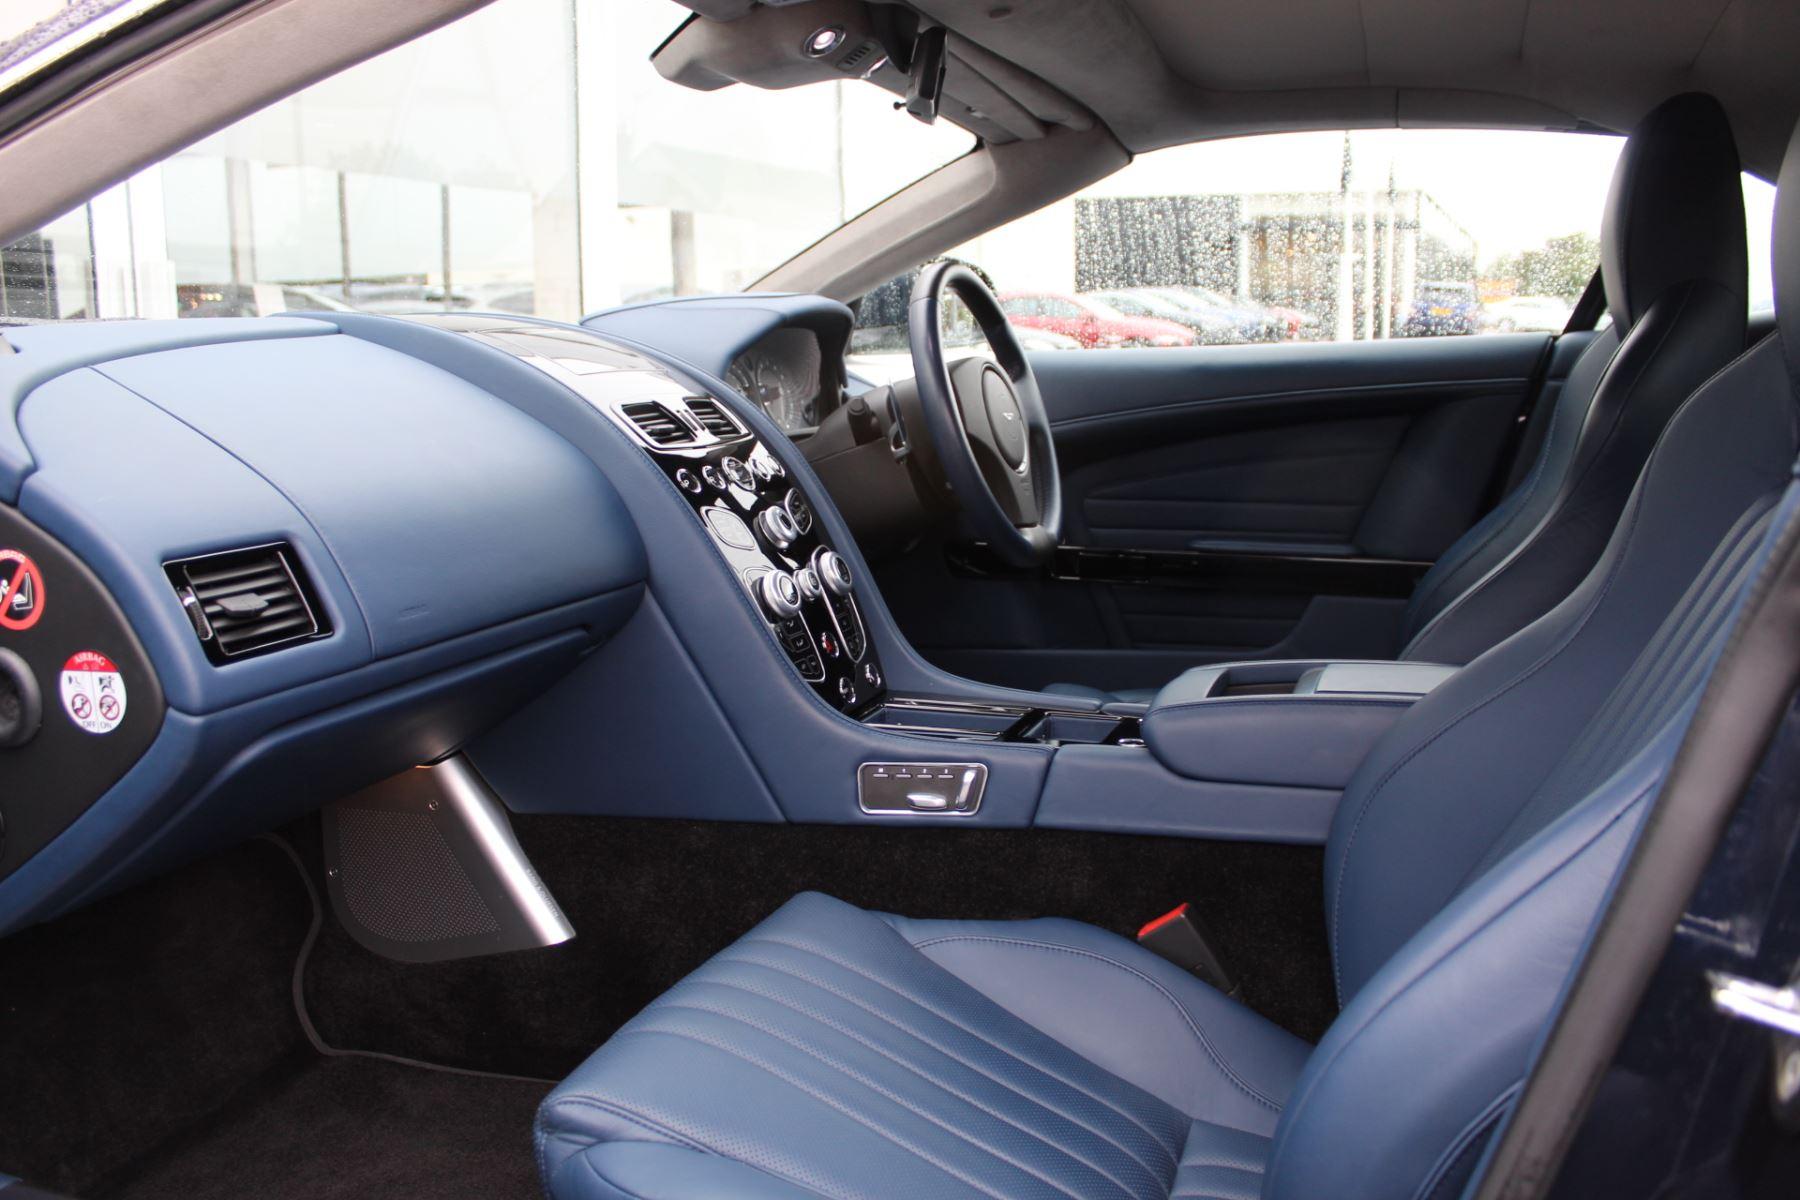 Aston Martin DB9 V12 GT 2dr Volante Touchtronic image 11